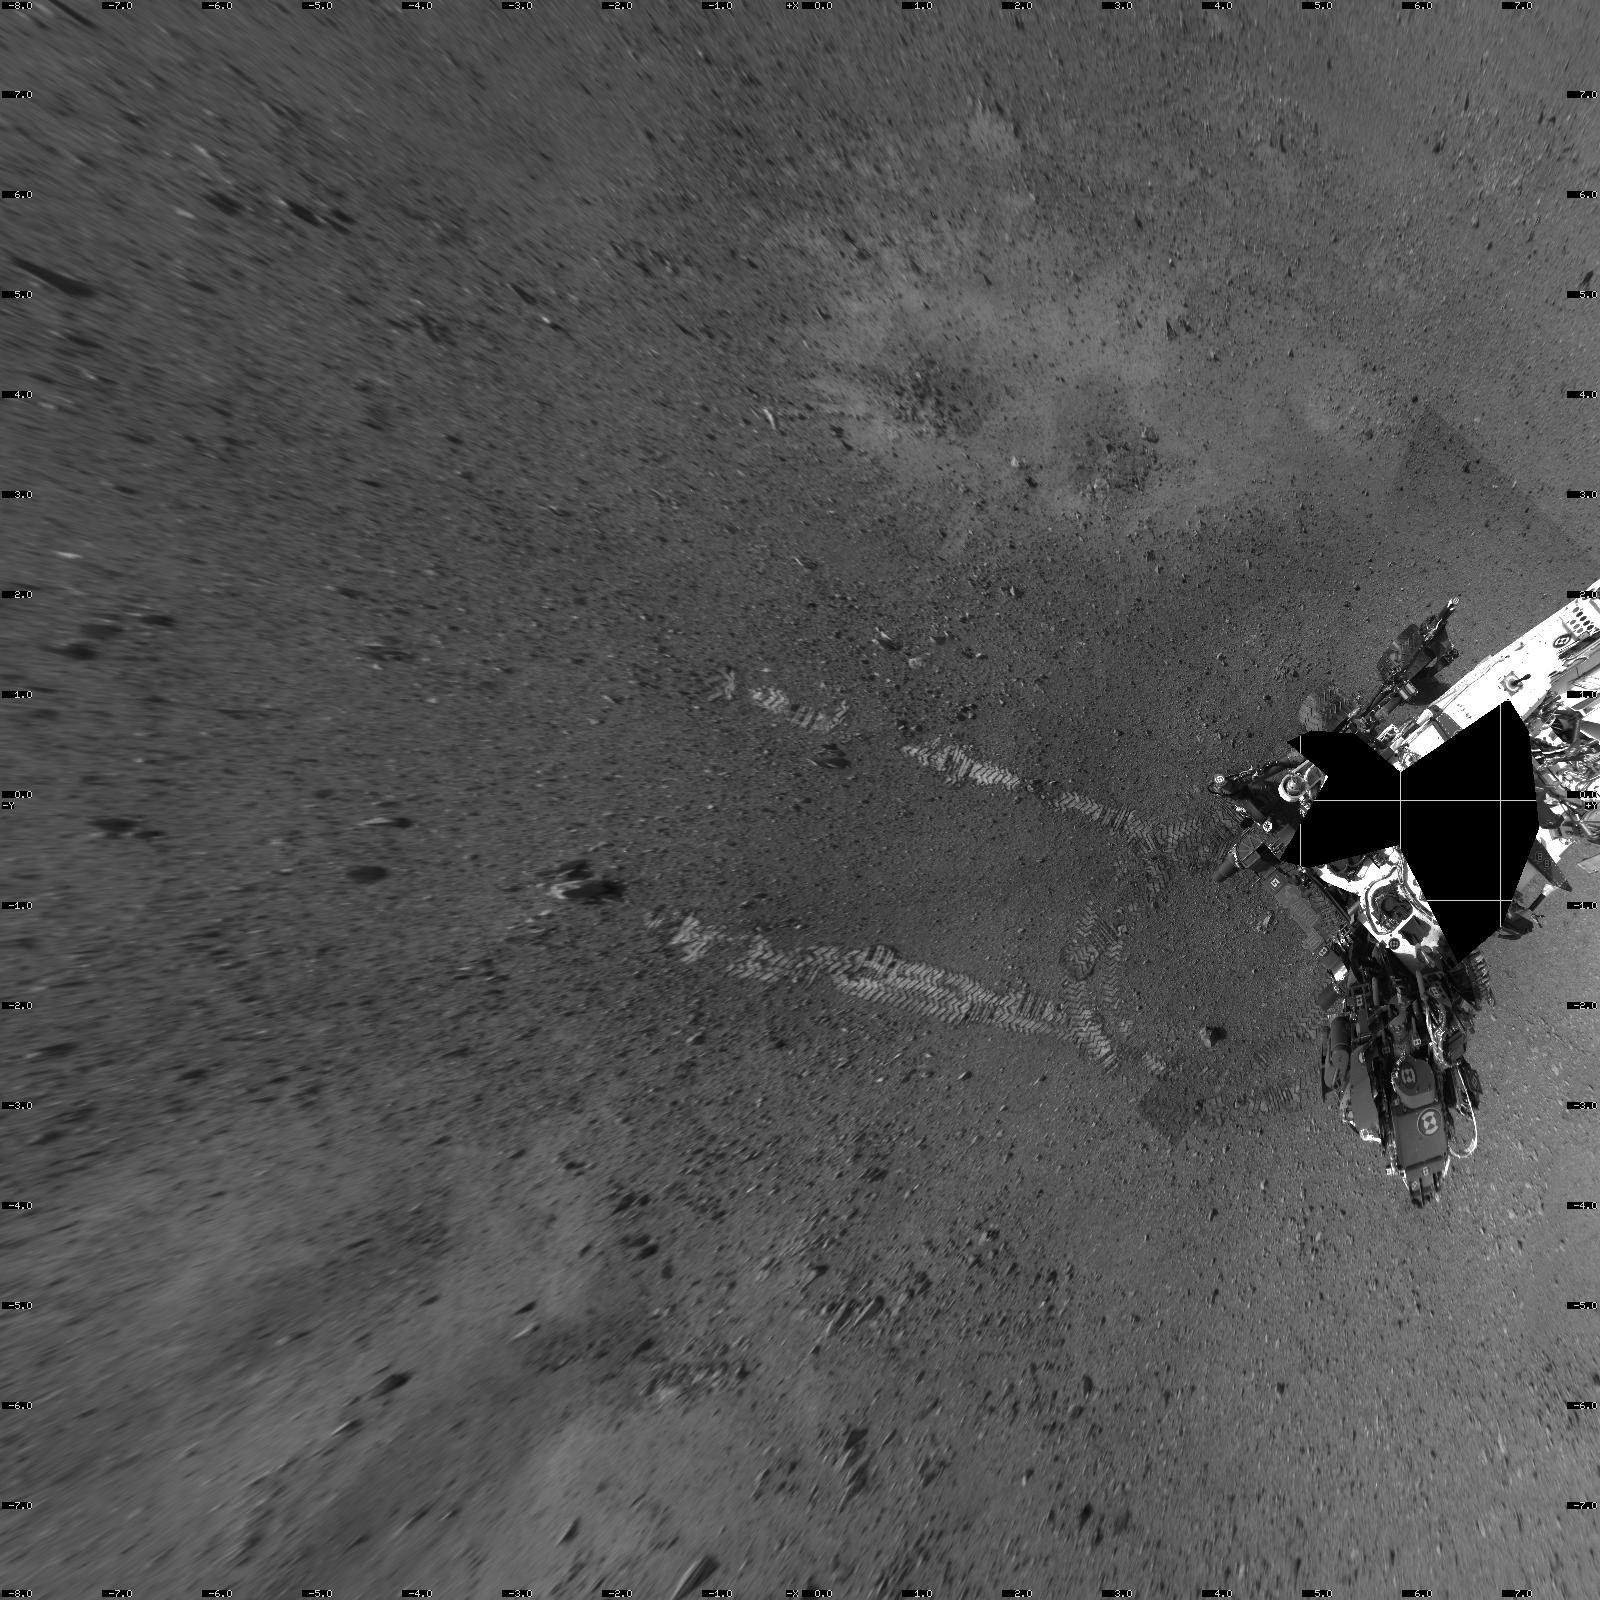 """In tribute, I dedicate my landing spot on Mars to you, Ray Bradbury. Welcome to Bradbury Landing..."" — Curiosity"